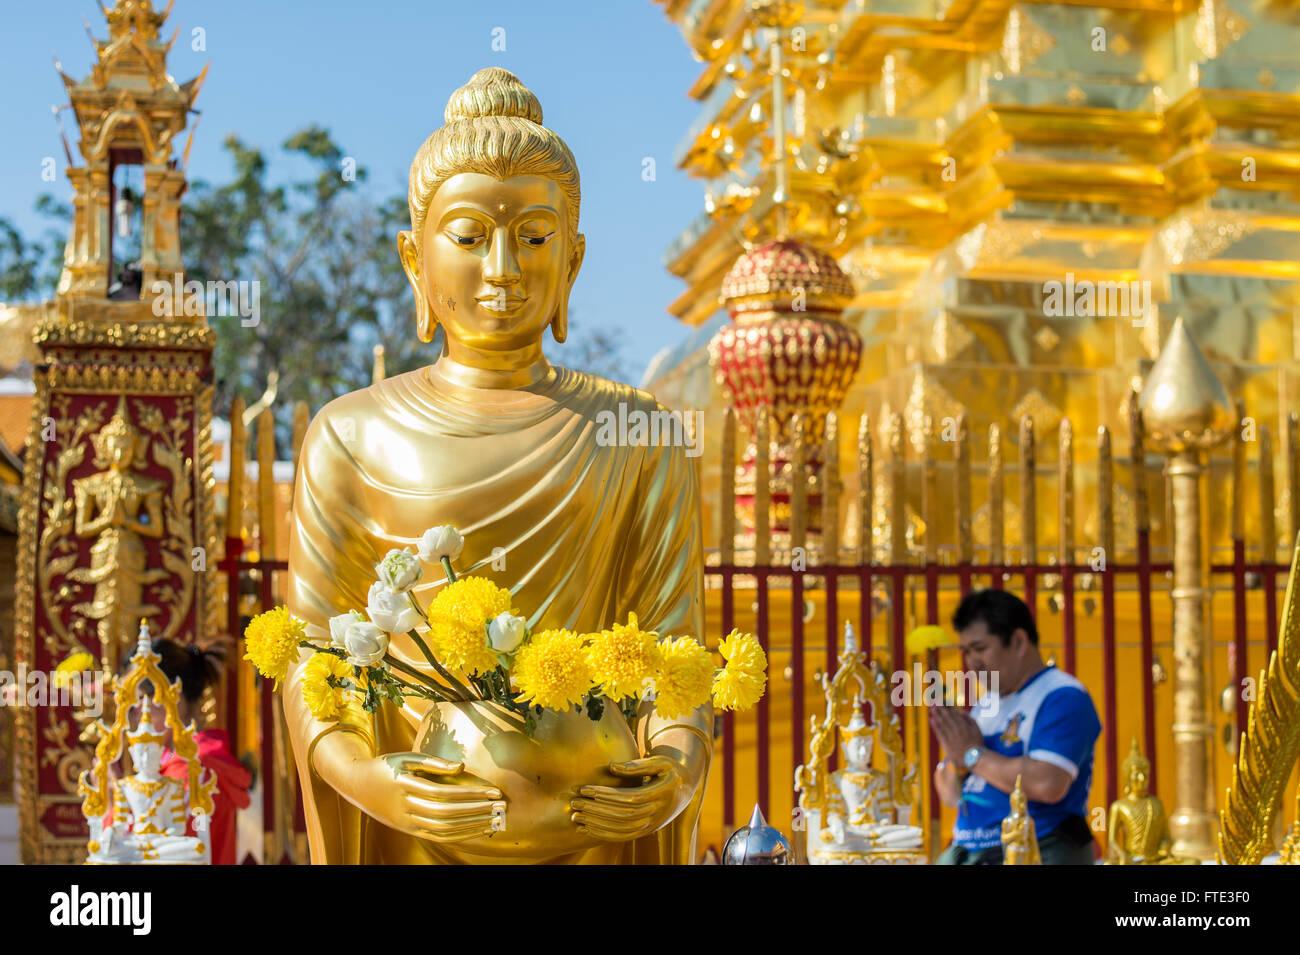 Thai people worship at Wat Phra That Doi Suthep in Chiang Mai, Thailand - Stock Image